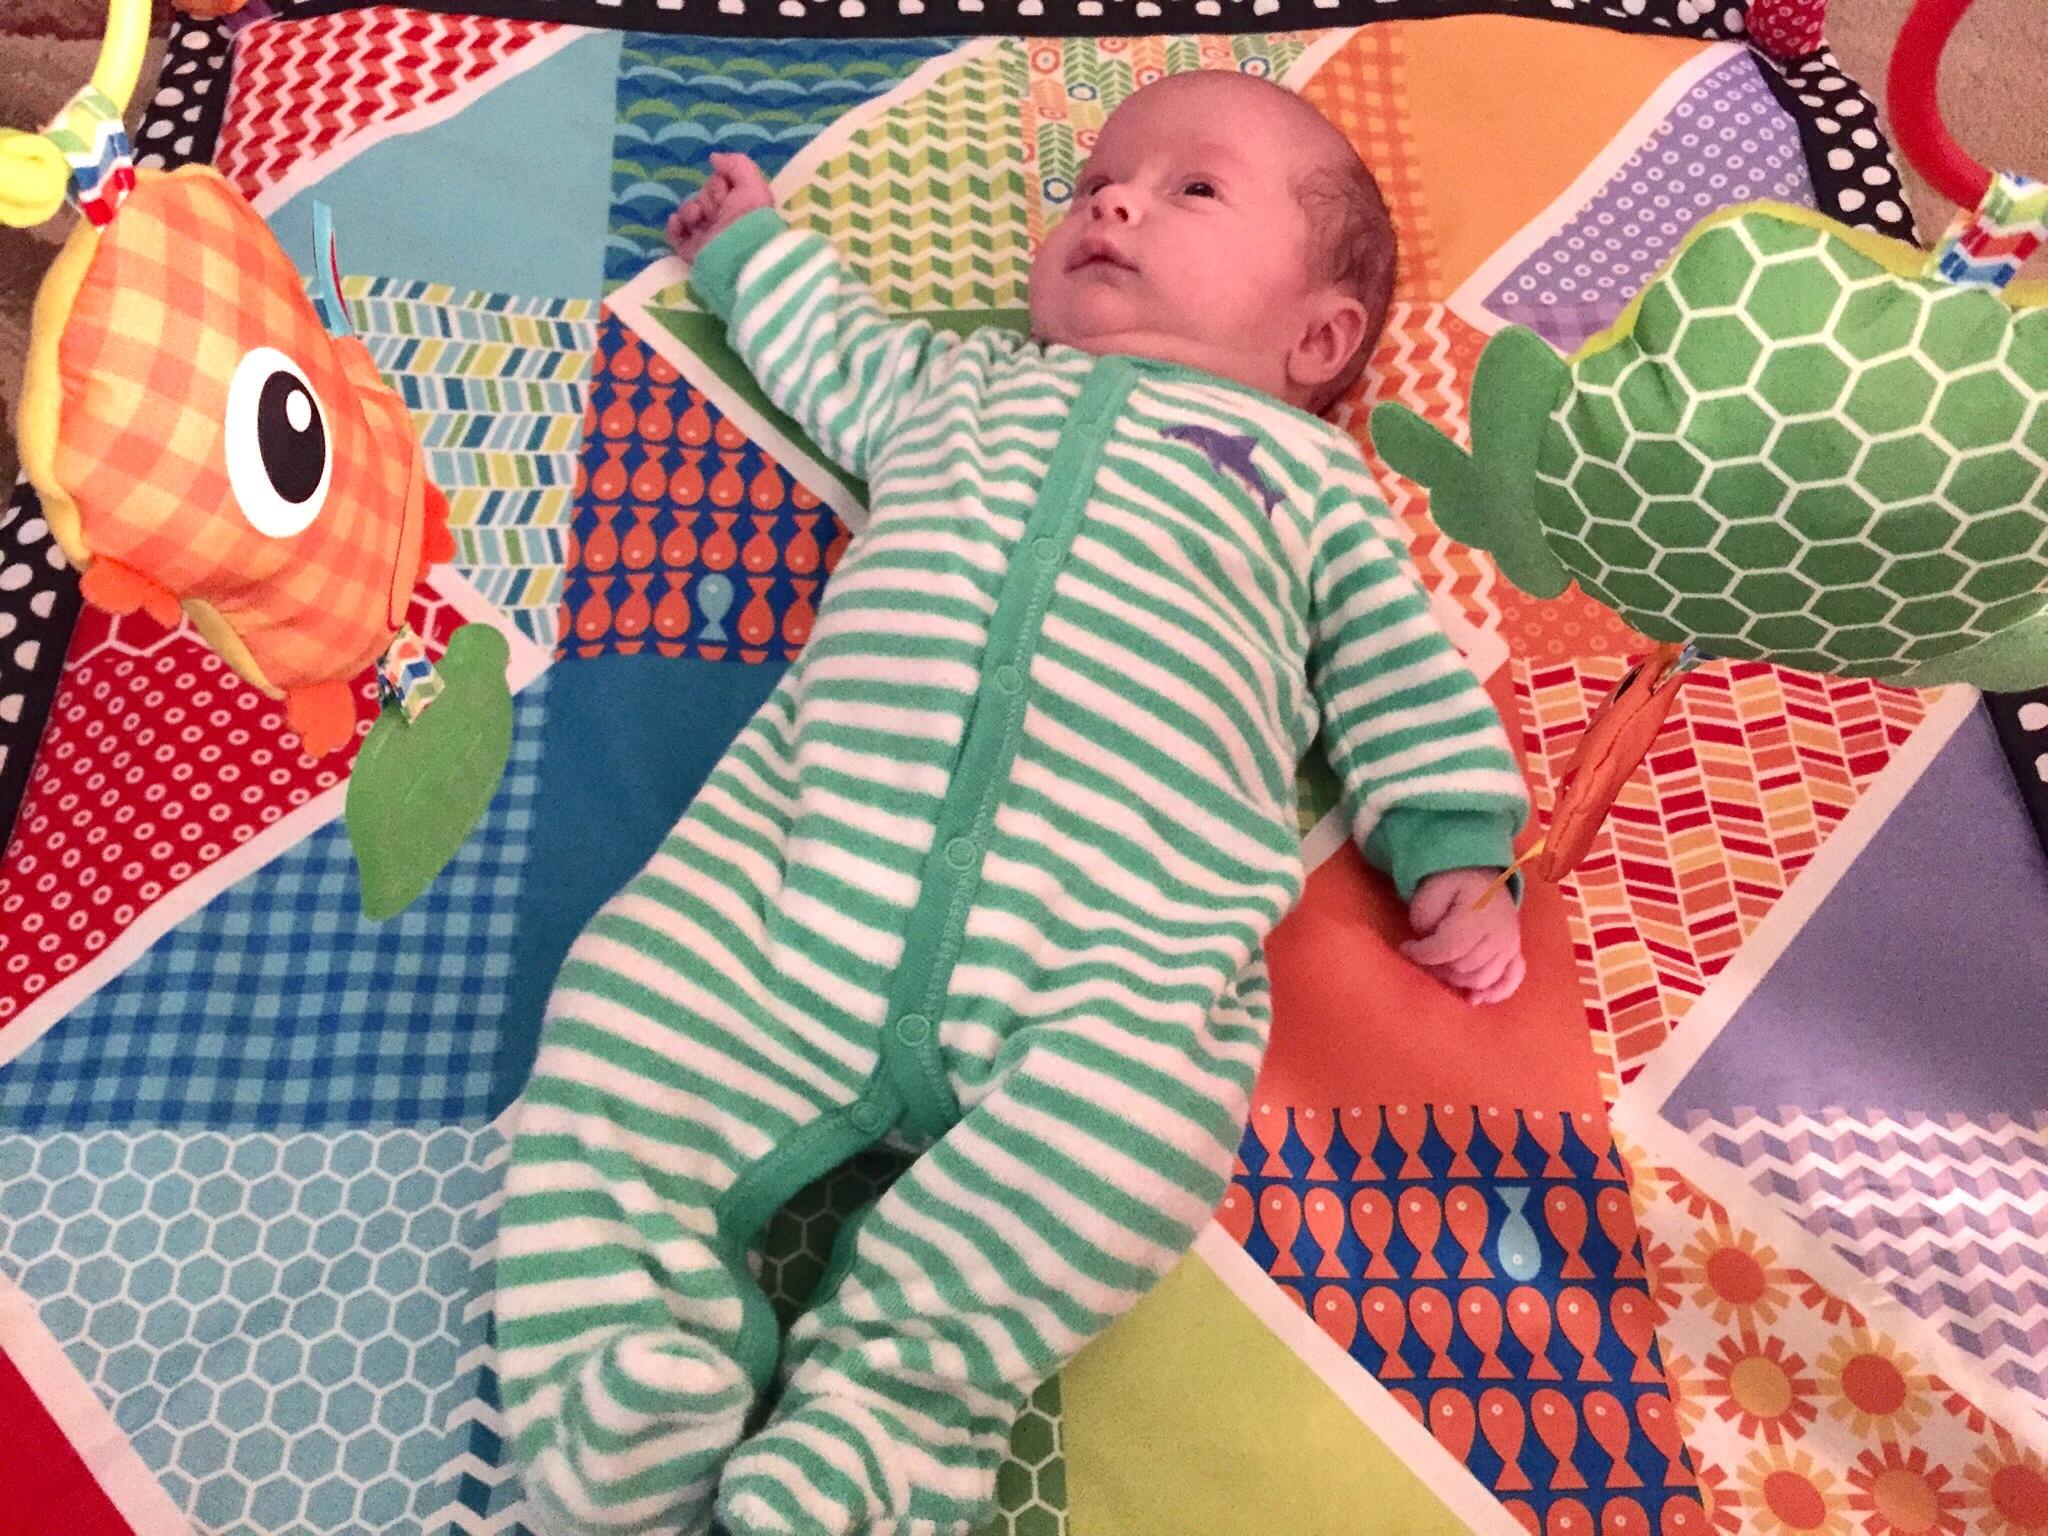 Spencer on play mat